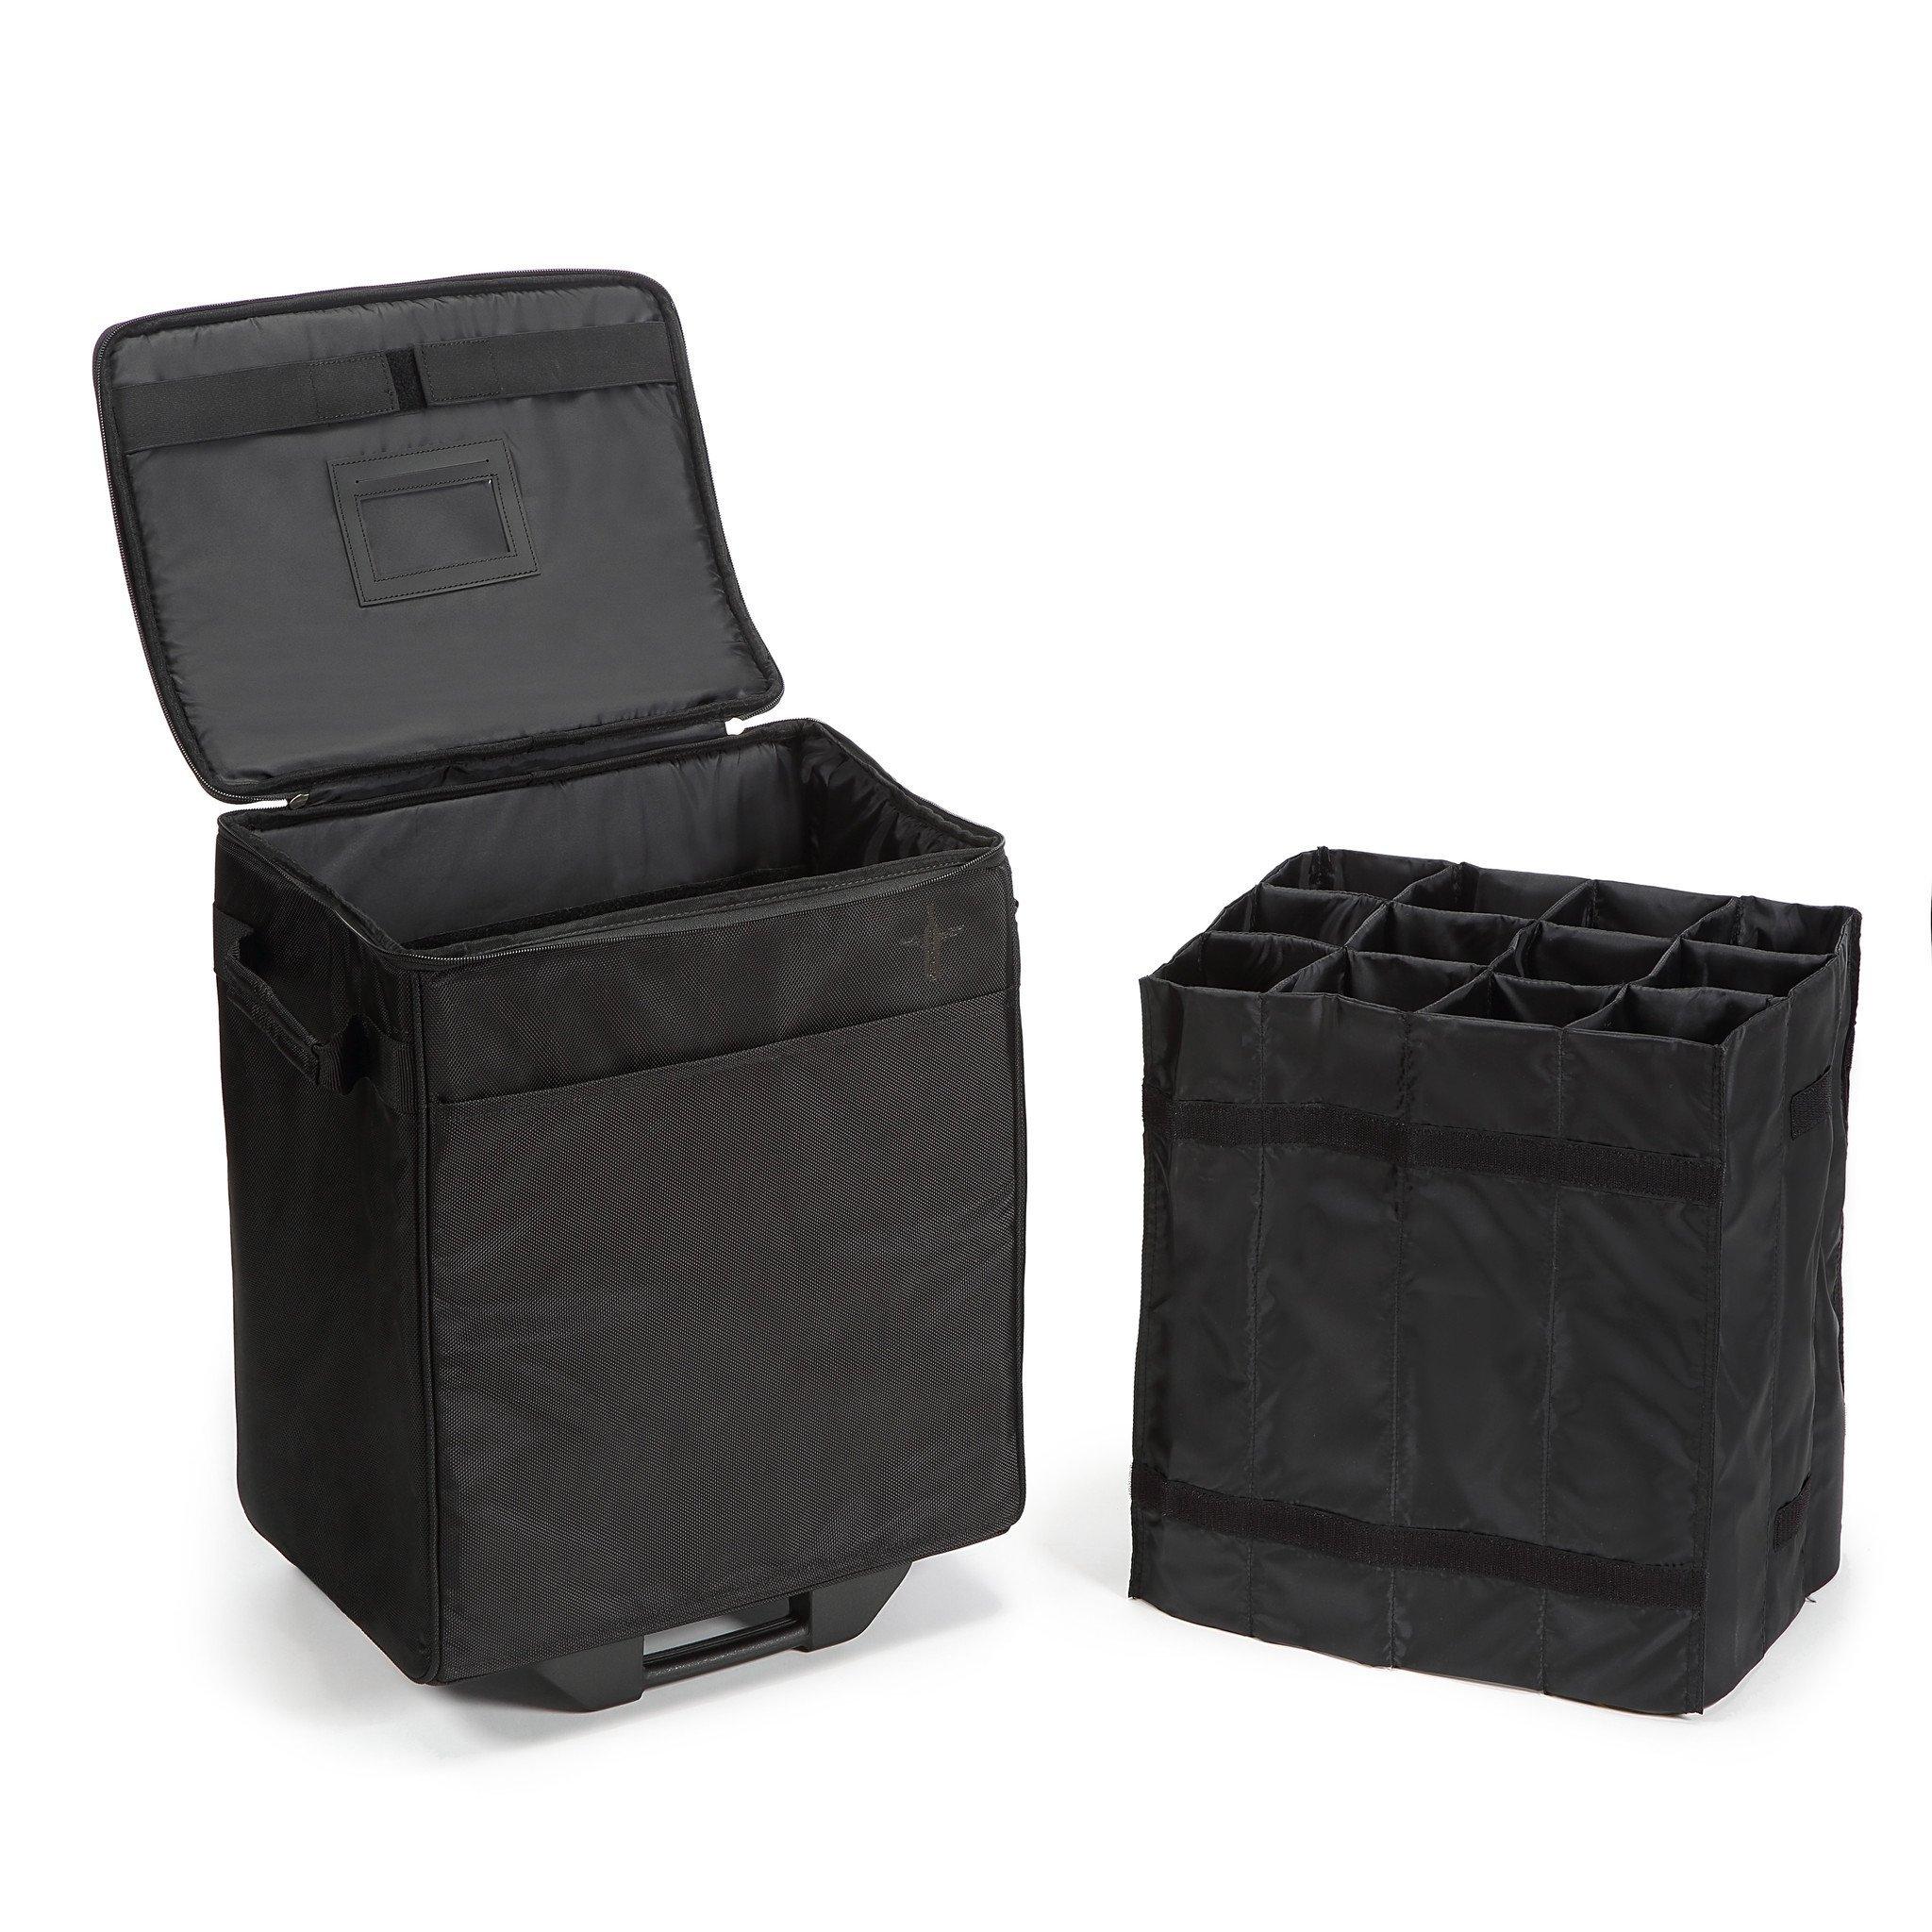 WineCheck Elite (6-12 bottle) set WITH shipper box/insert